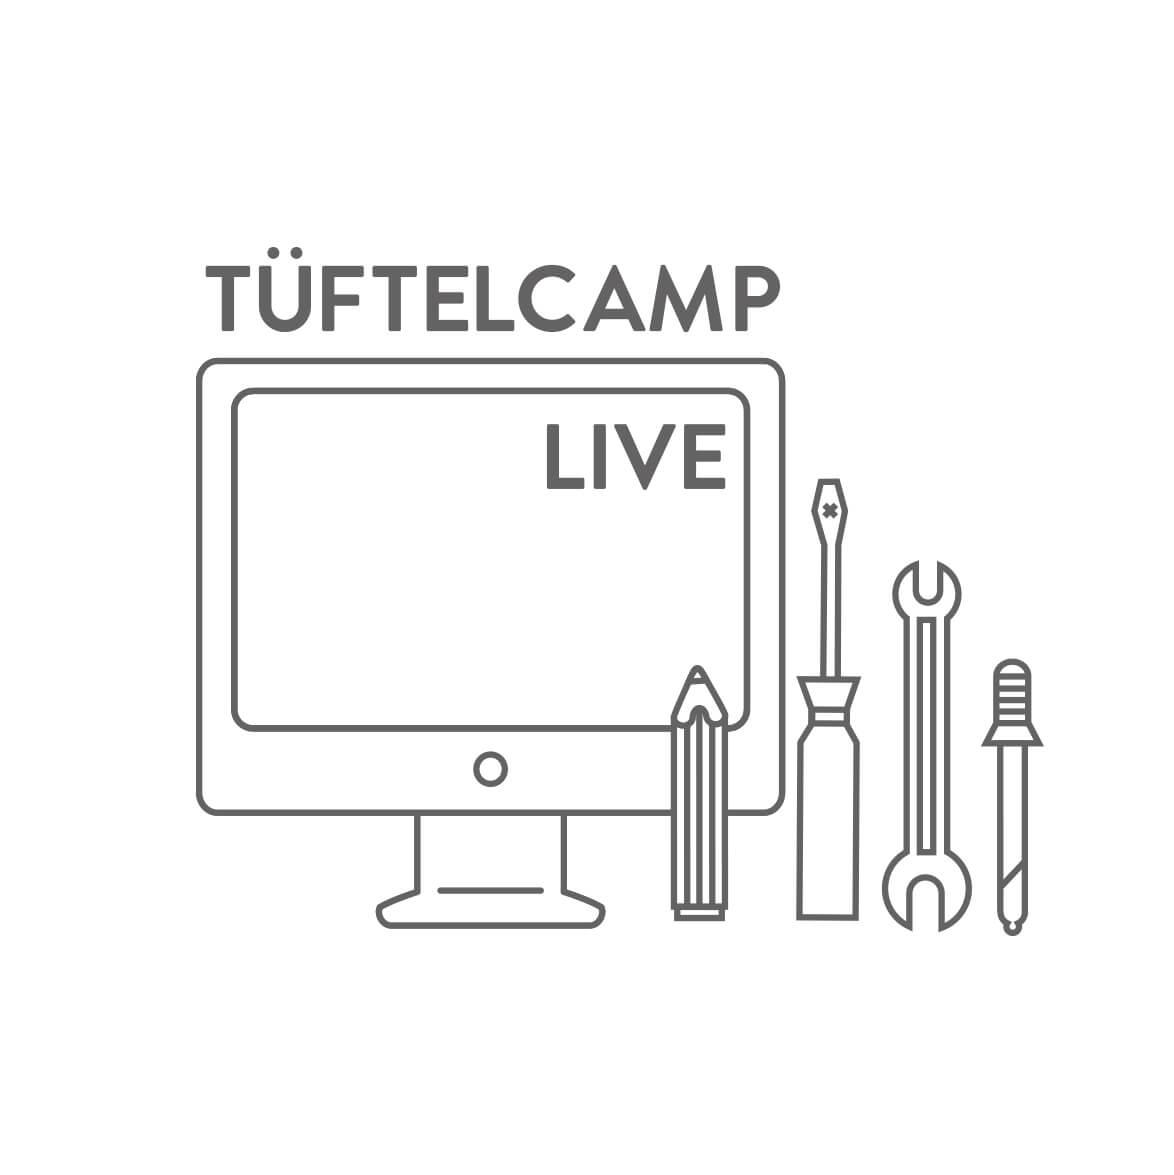 Tueftelcamp_Home